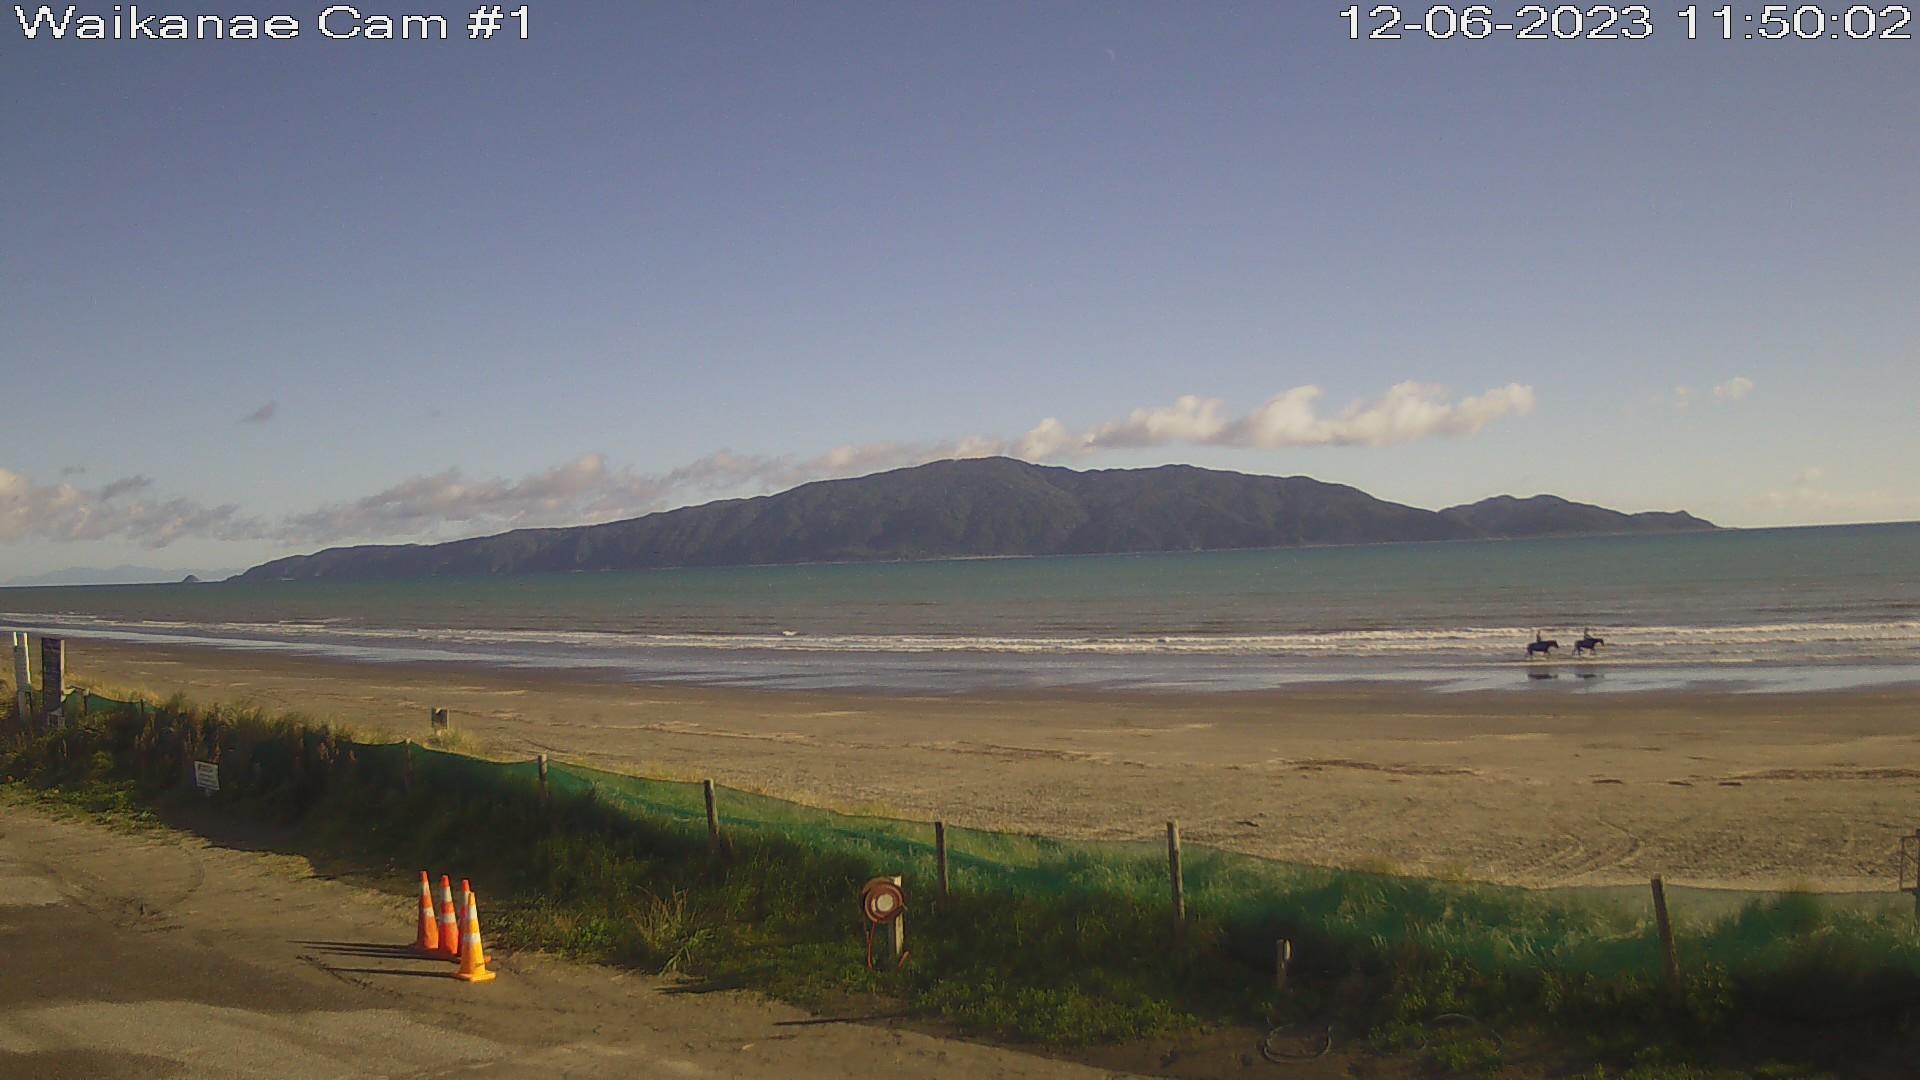 Webcam Waikanae Beach: Kapiti Island